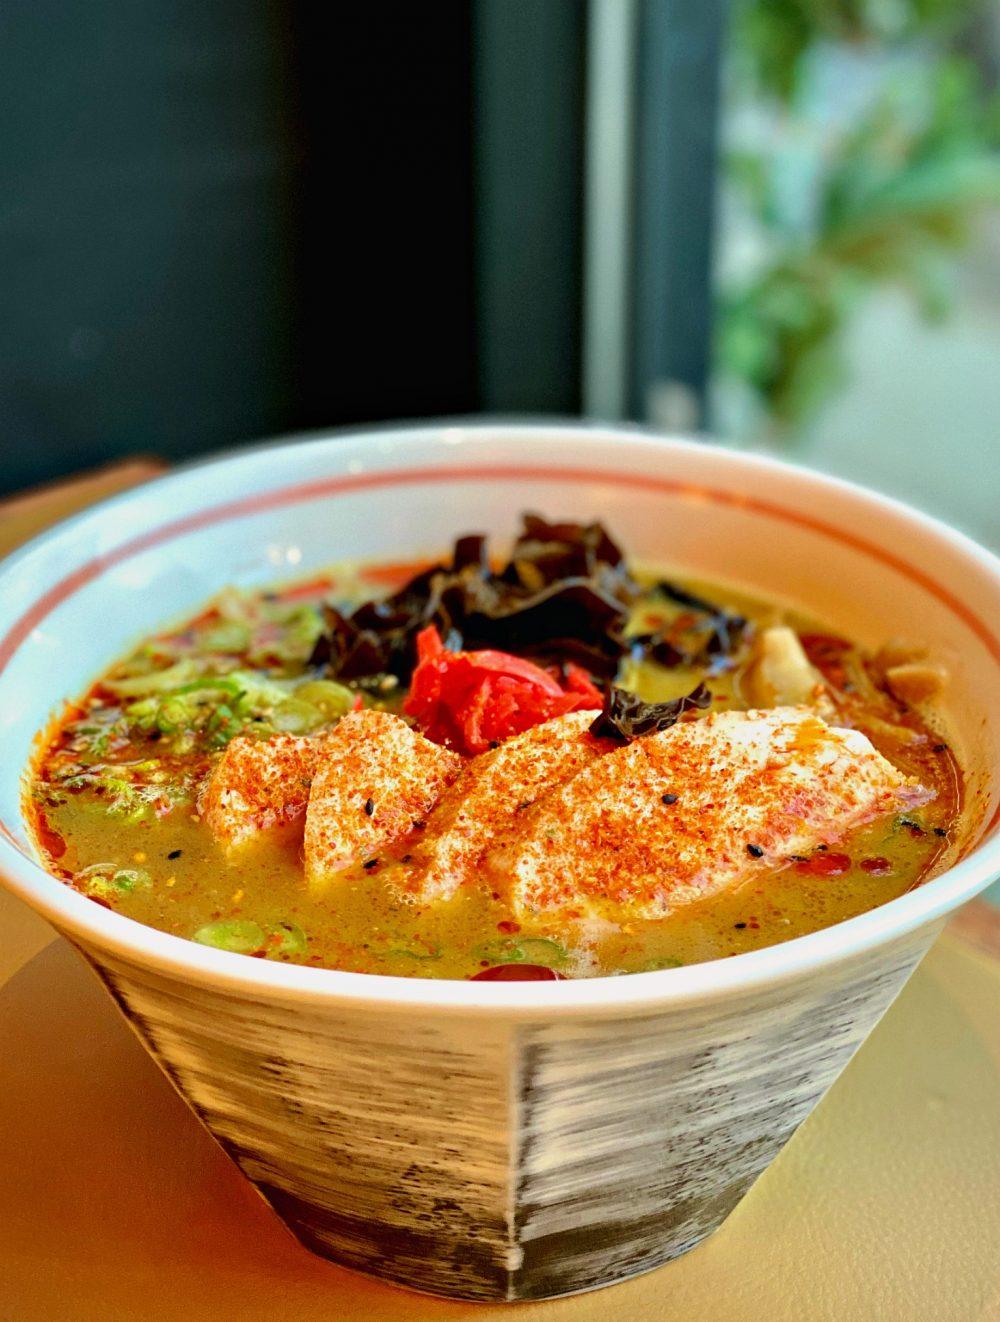 Curry Ramen with Chicken Chashu